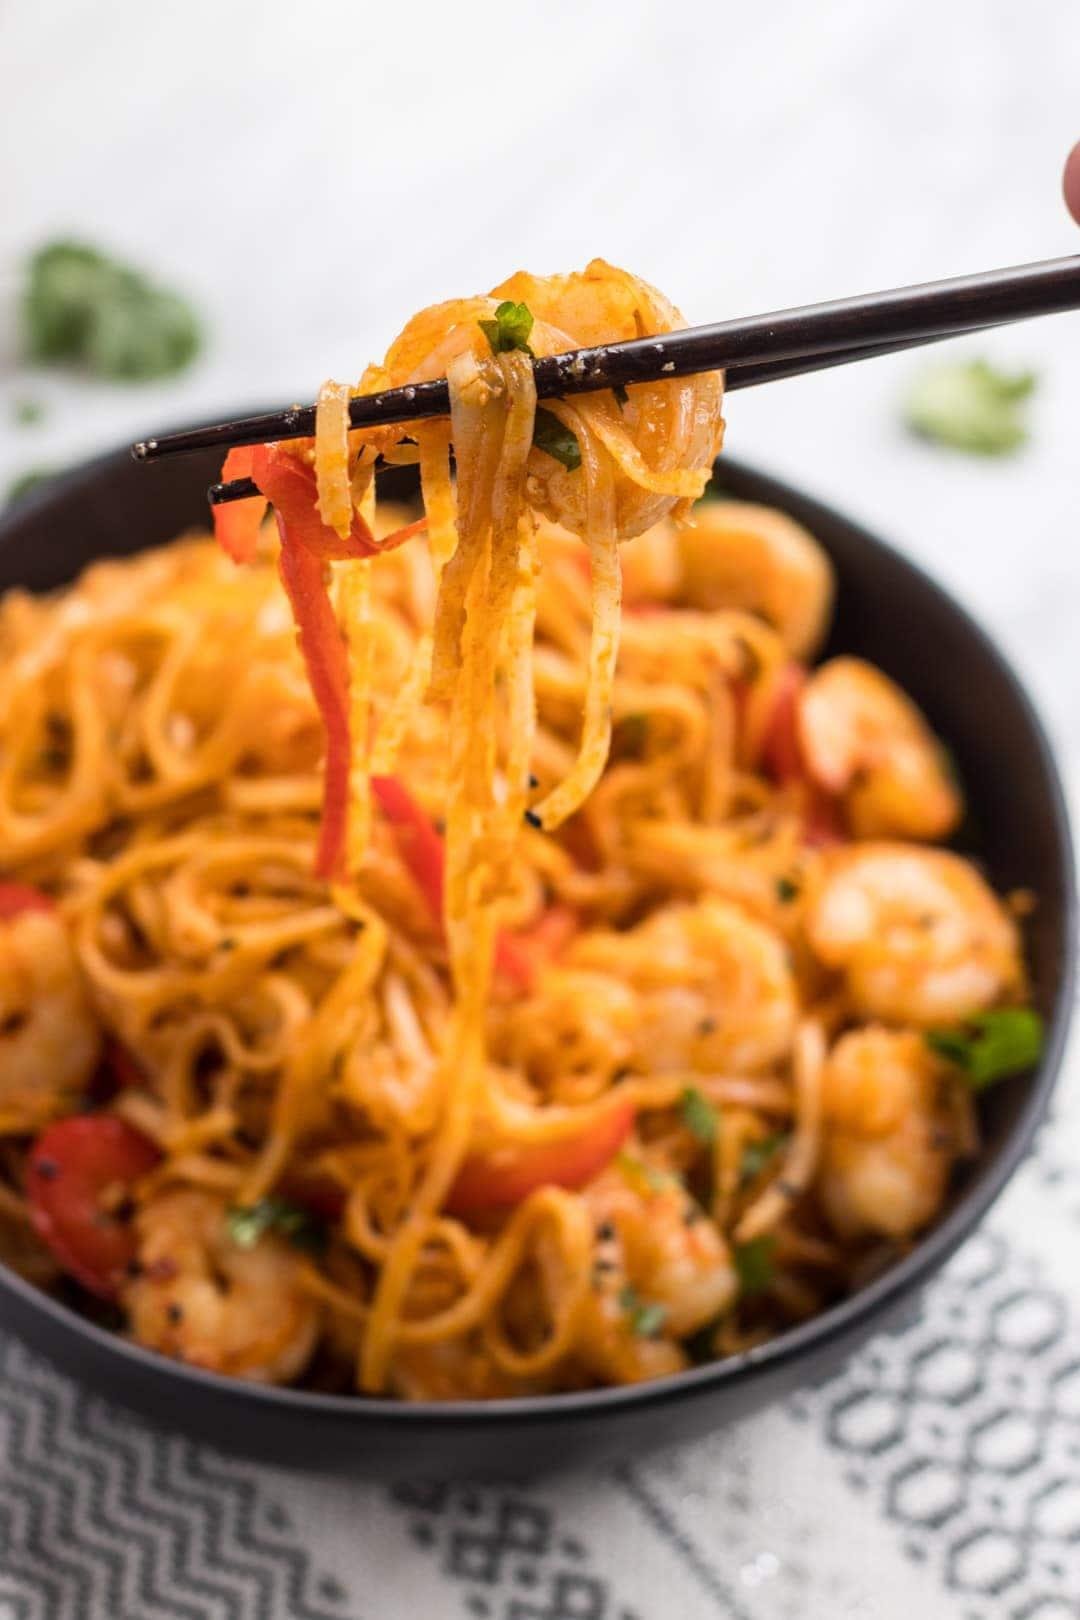 Chopsticks holding Low FODMAP Pad Thai with Shrimp